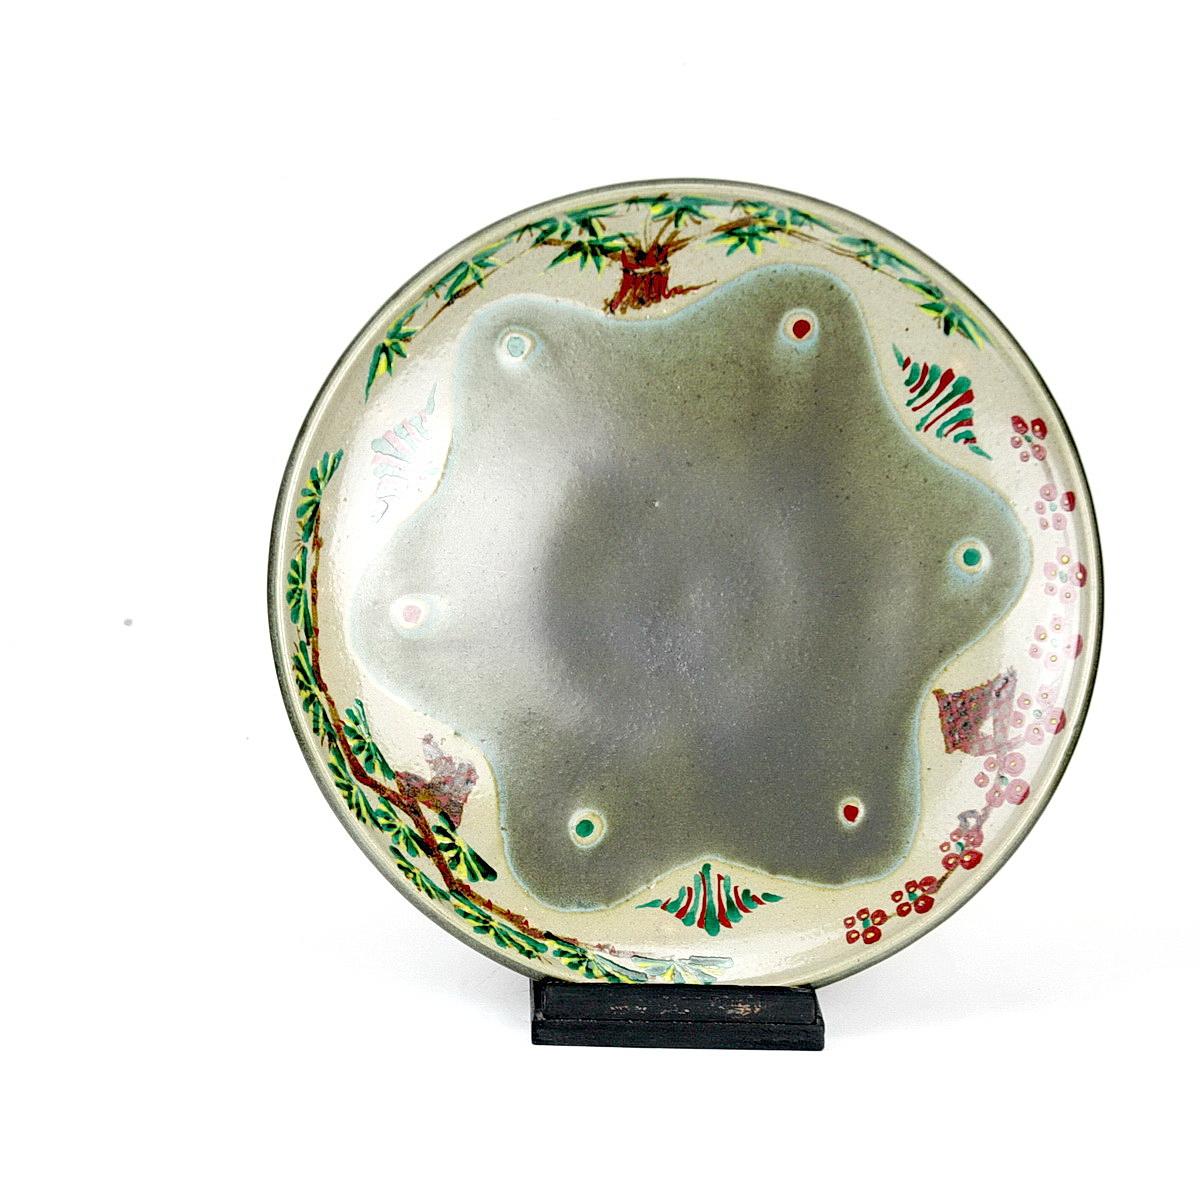 Tomoo Hamada stoneware dish with enamel decoration trees and berries